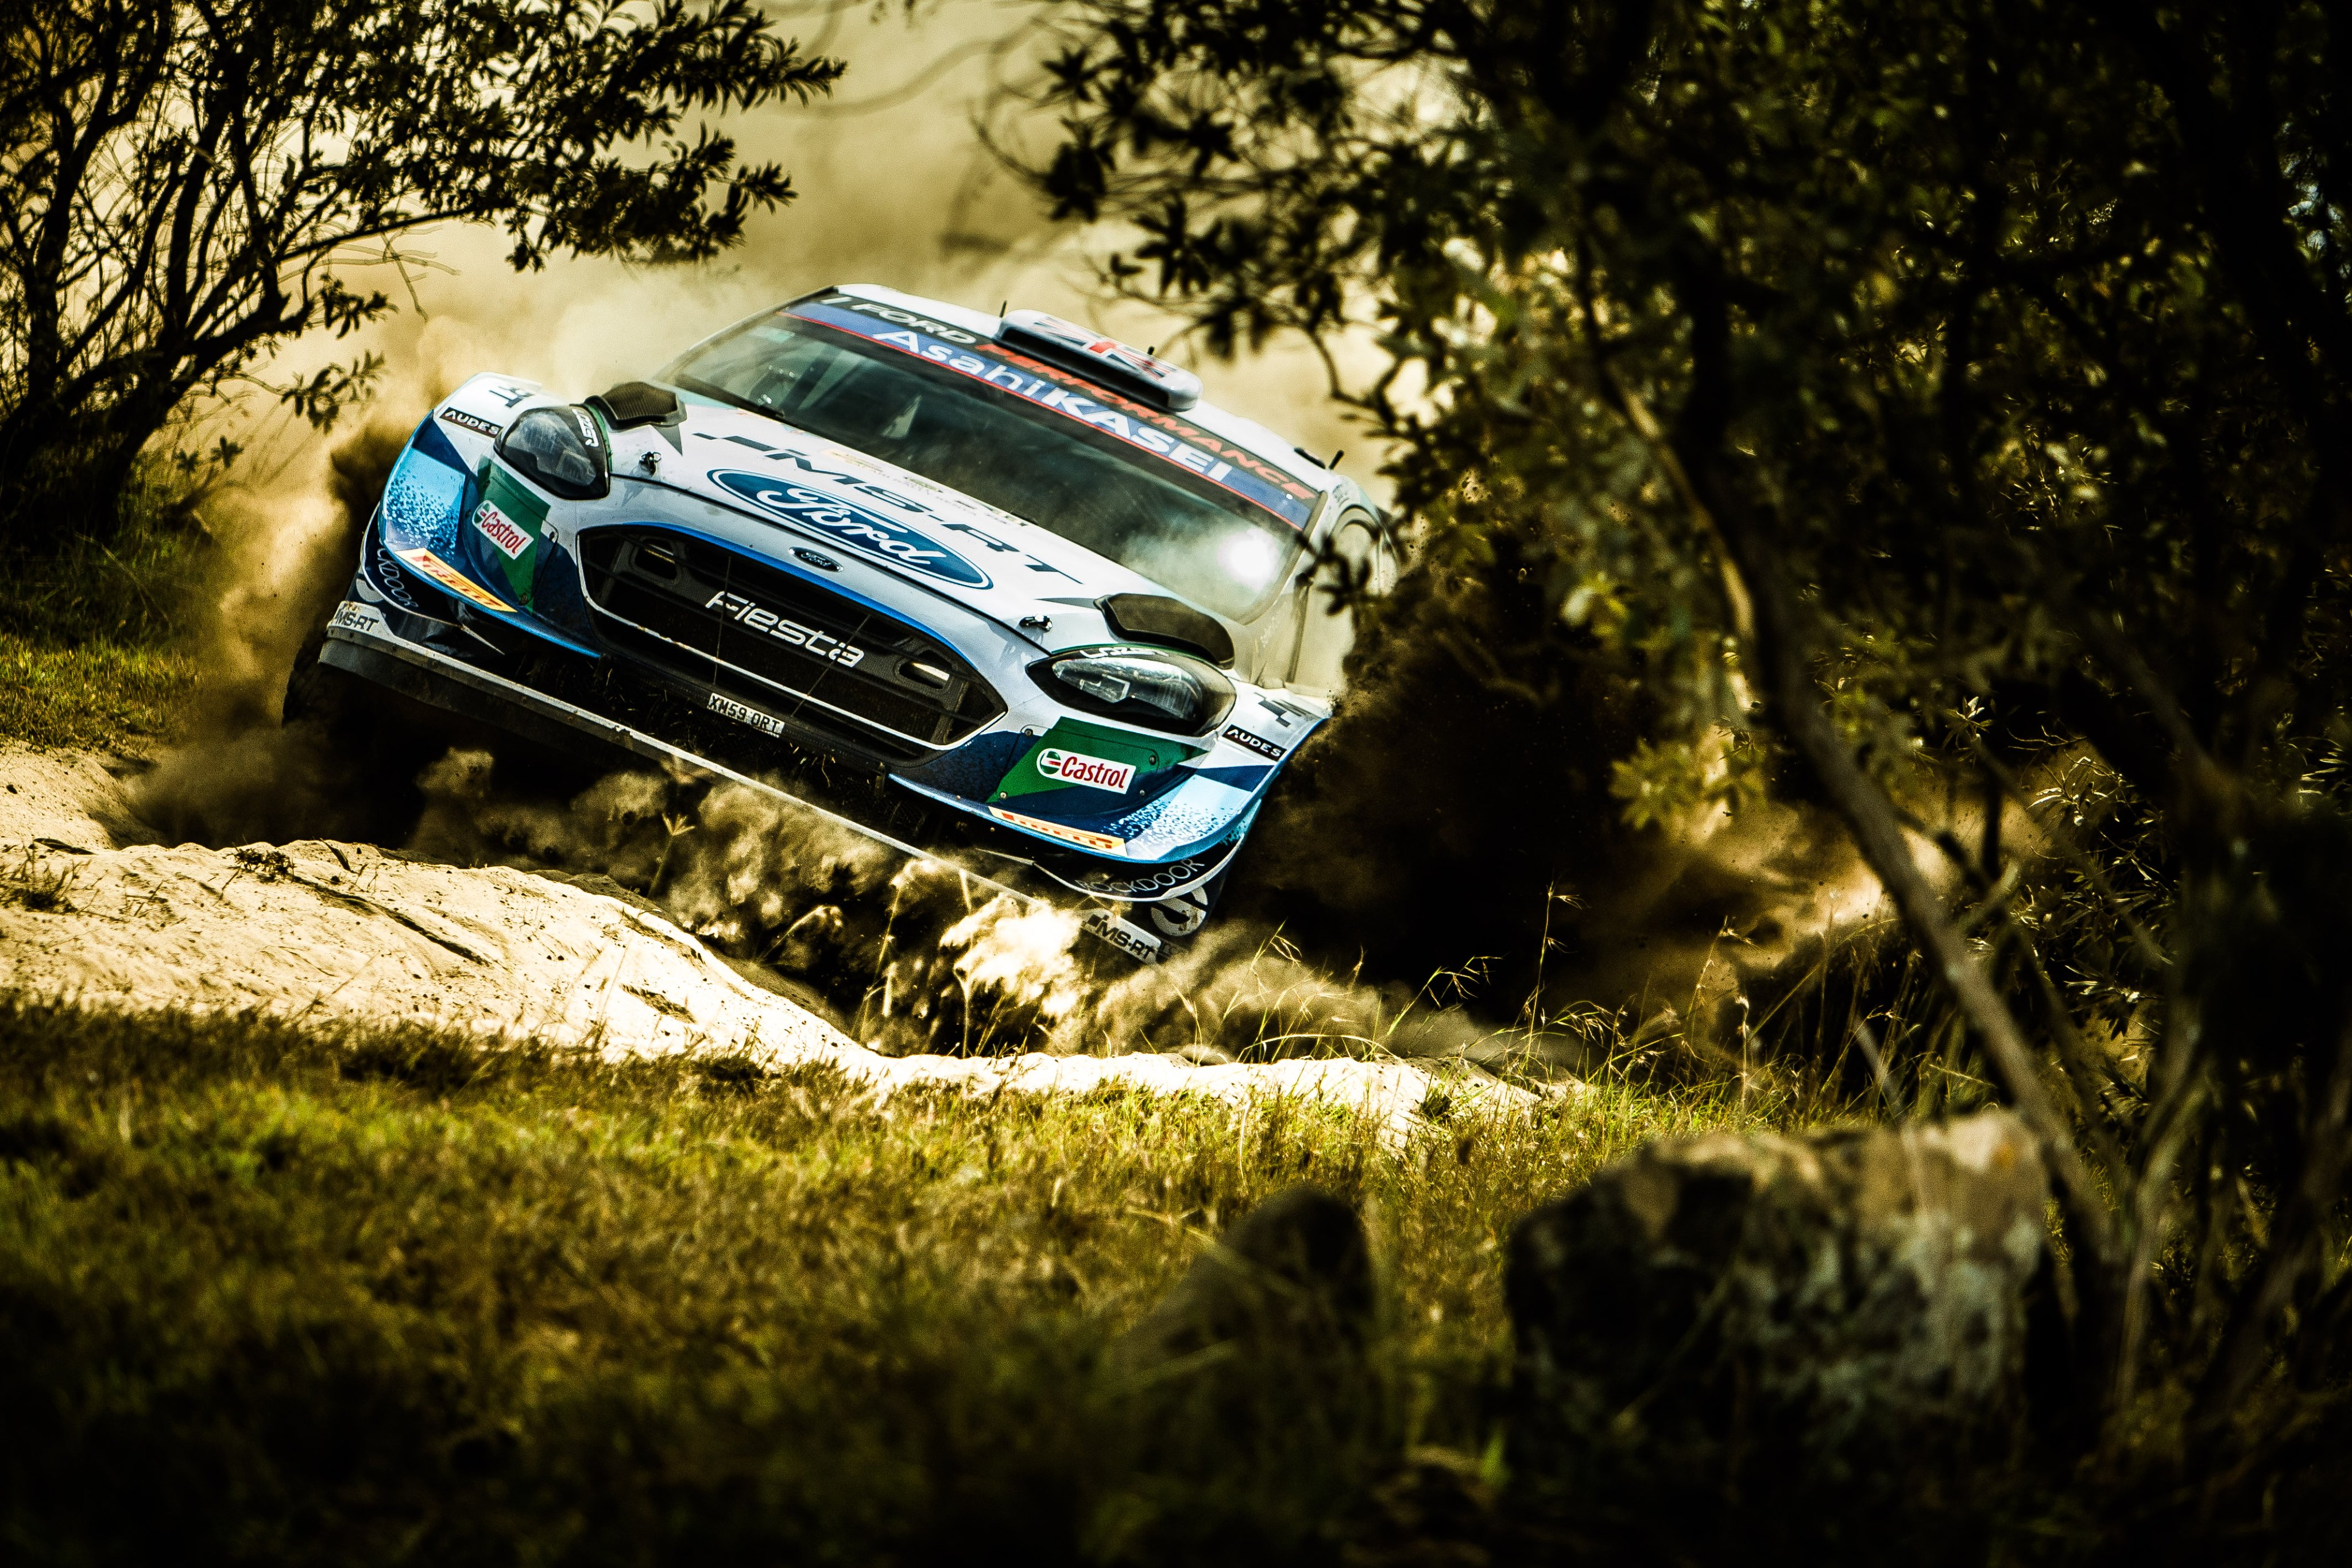 WRC: Safari Rally Kenya [23-27 Junio] - Página 4 E4z5RWOXMAM_PVS?format=jpg&name=4096x4096